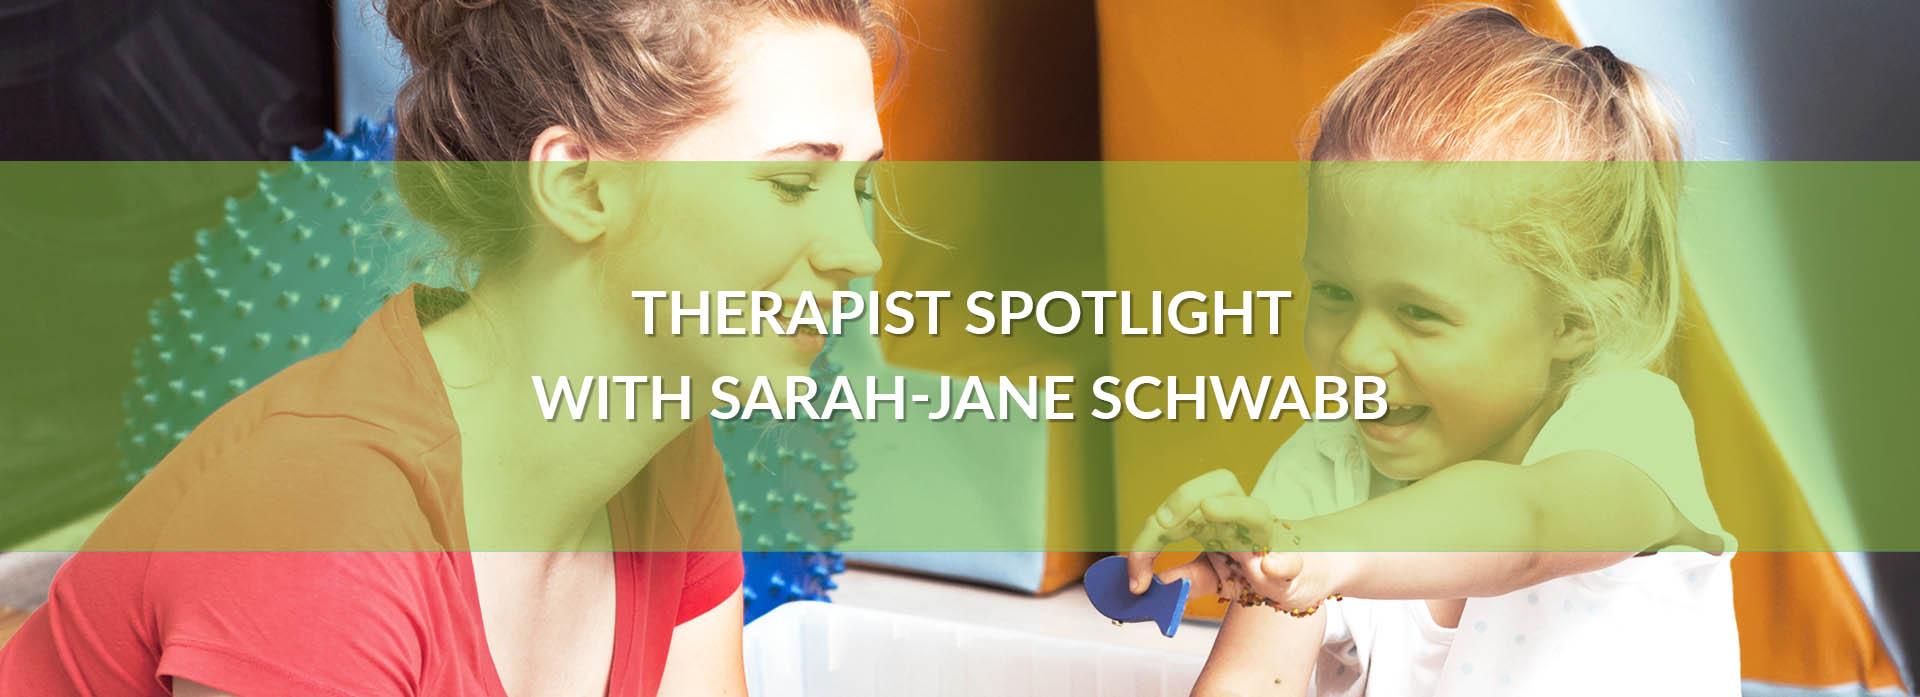 Autism Therapist Spotlight with Sarah-Jane Schwabb